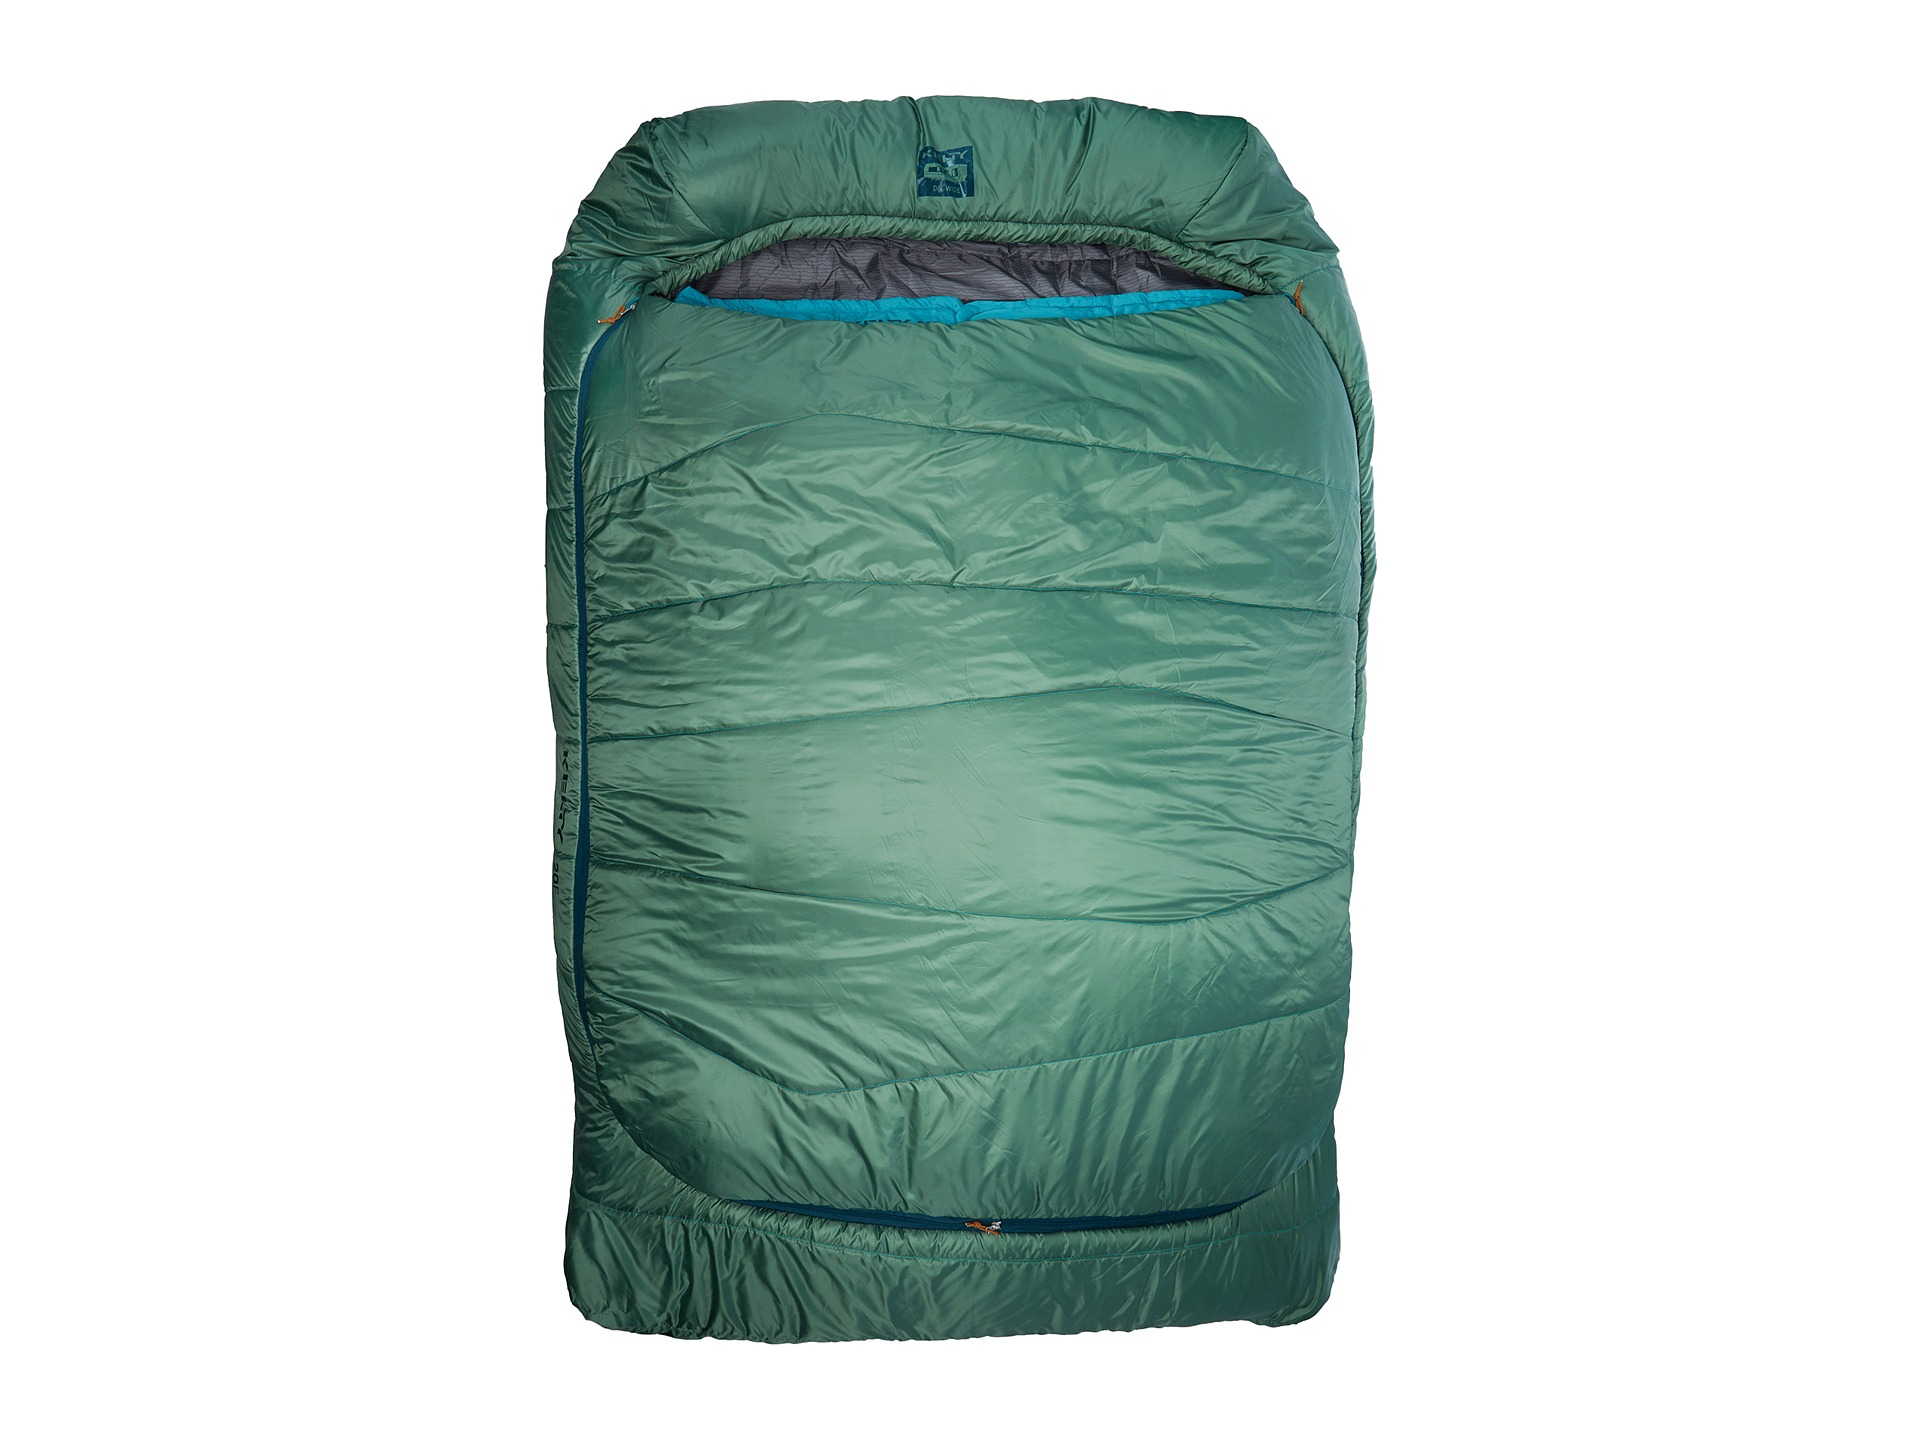 Kelty Tru.Comfort 20 Degree Sleeping Bag